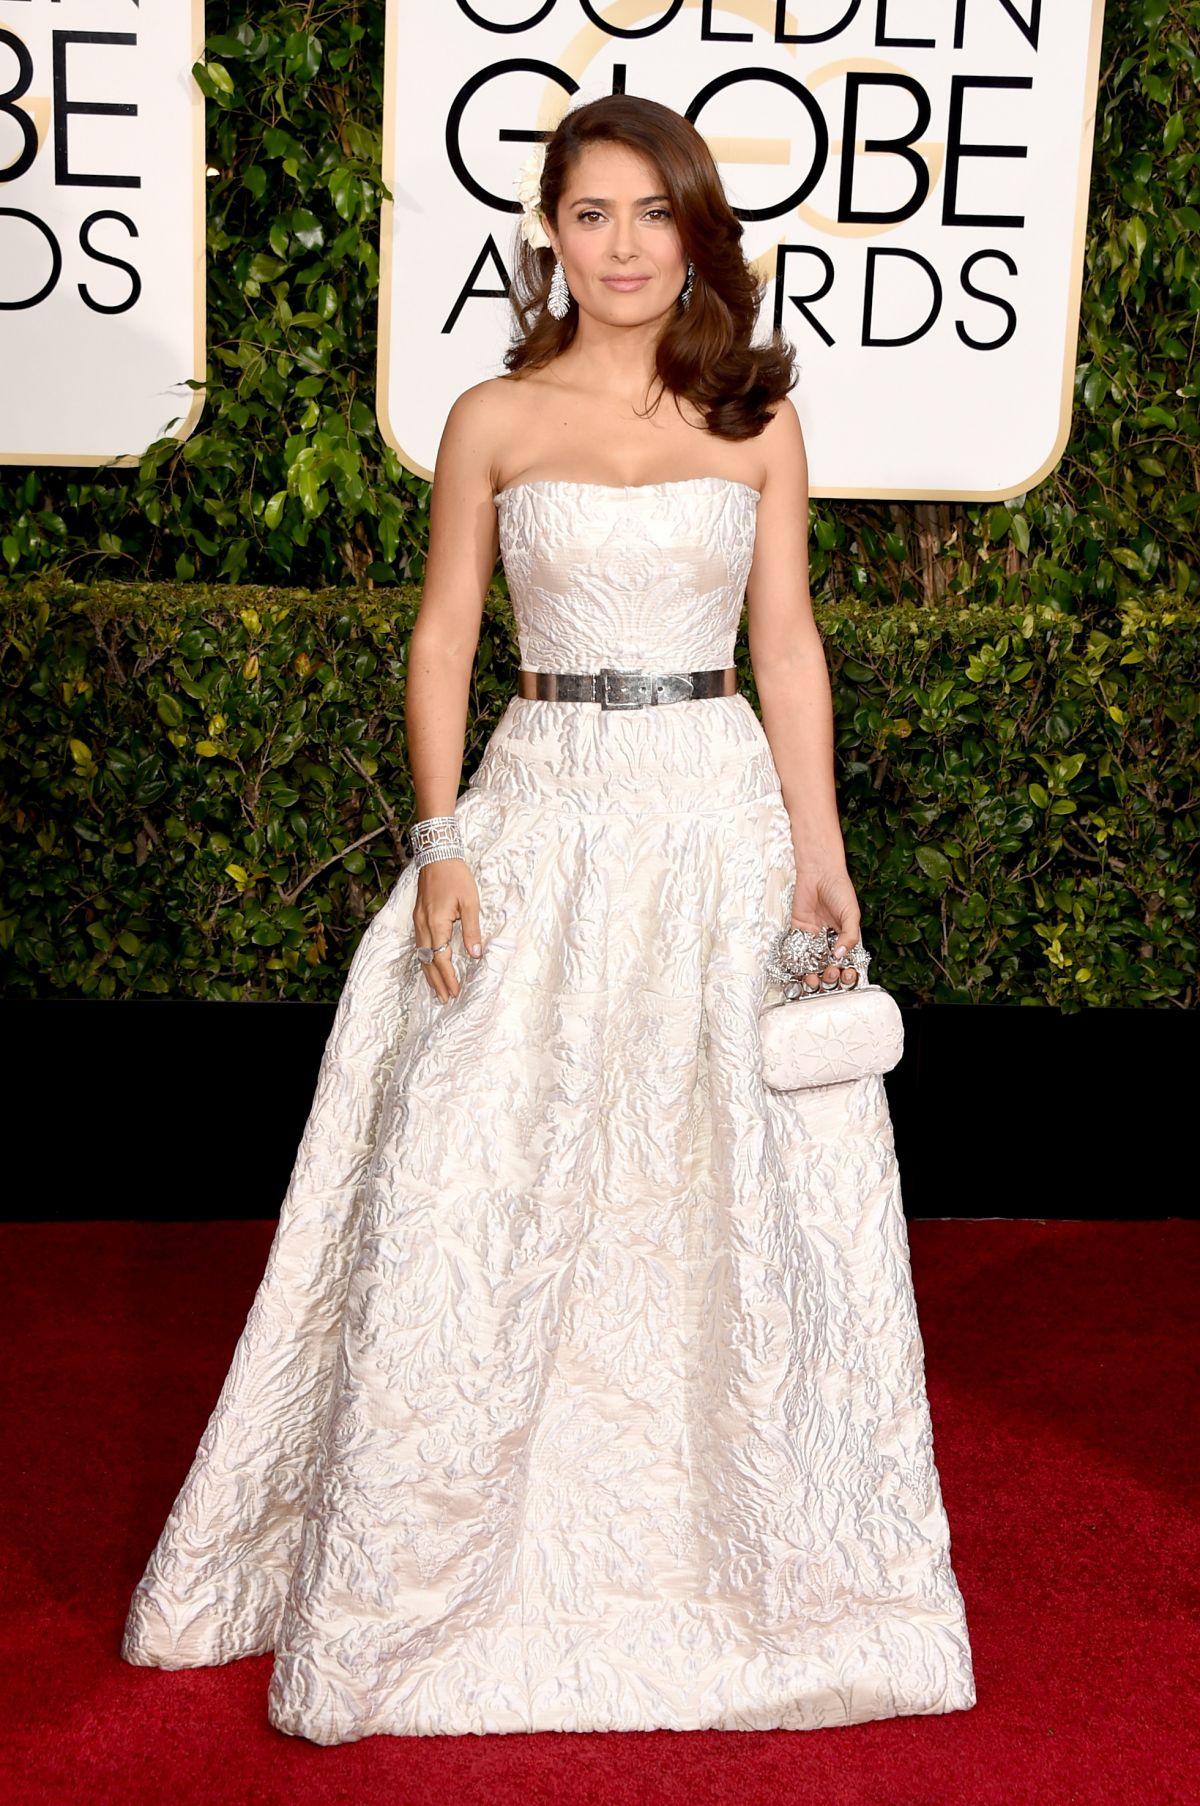 SALMA HAYEK at 2015 Golden Globe Awards in Beverly Hills